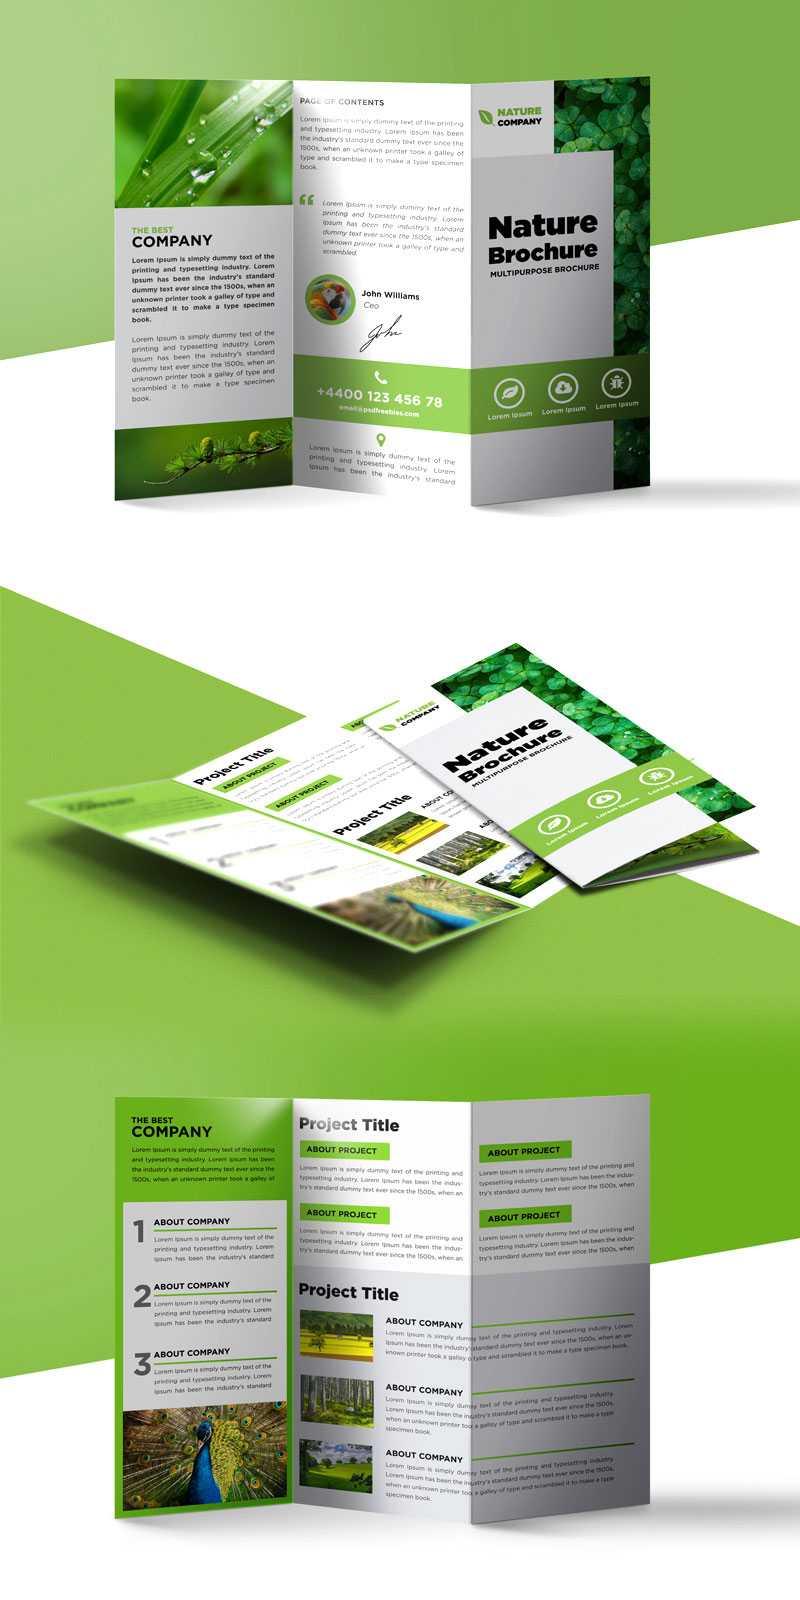 Nature Tri Fold Brochure Template Free Psd | Psdfreebies With Free Three Fold Brochure Template